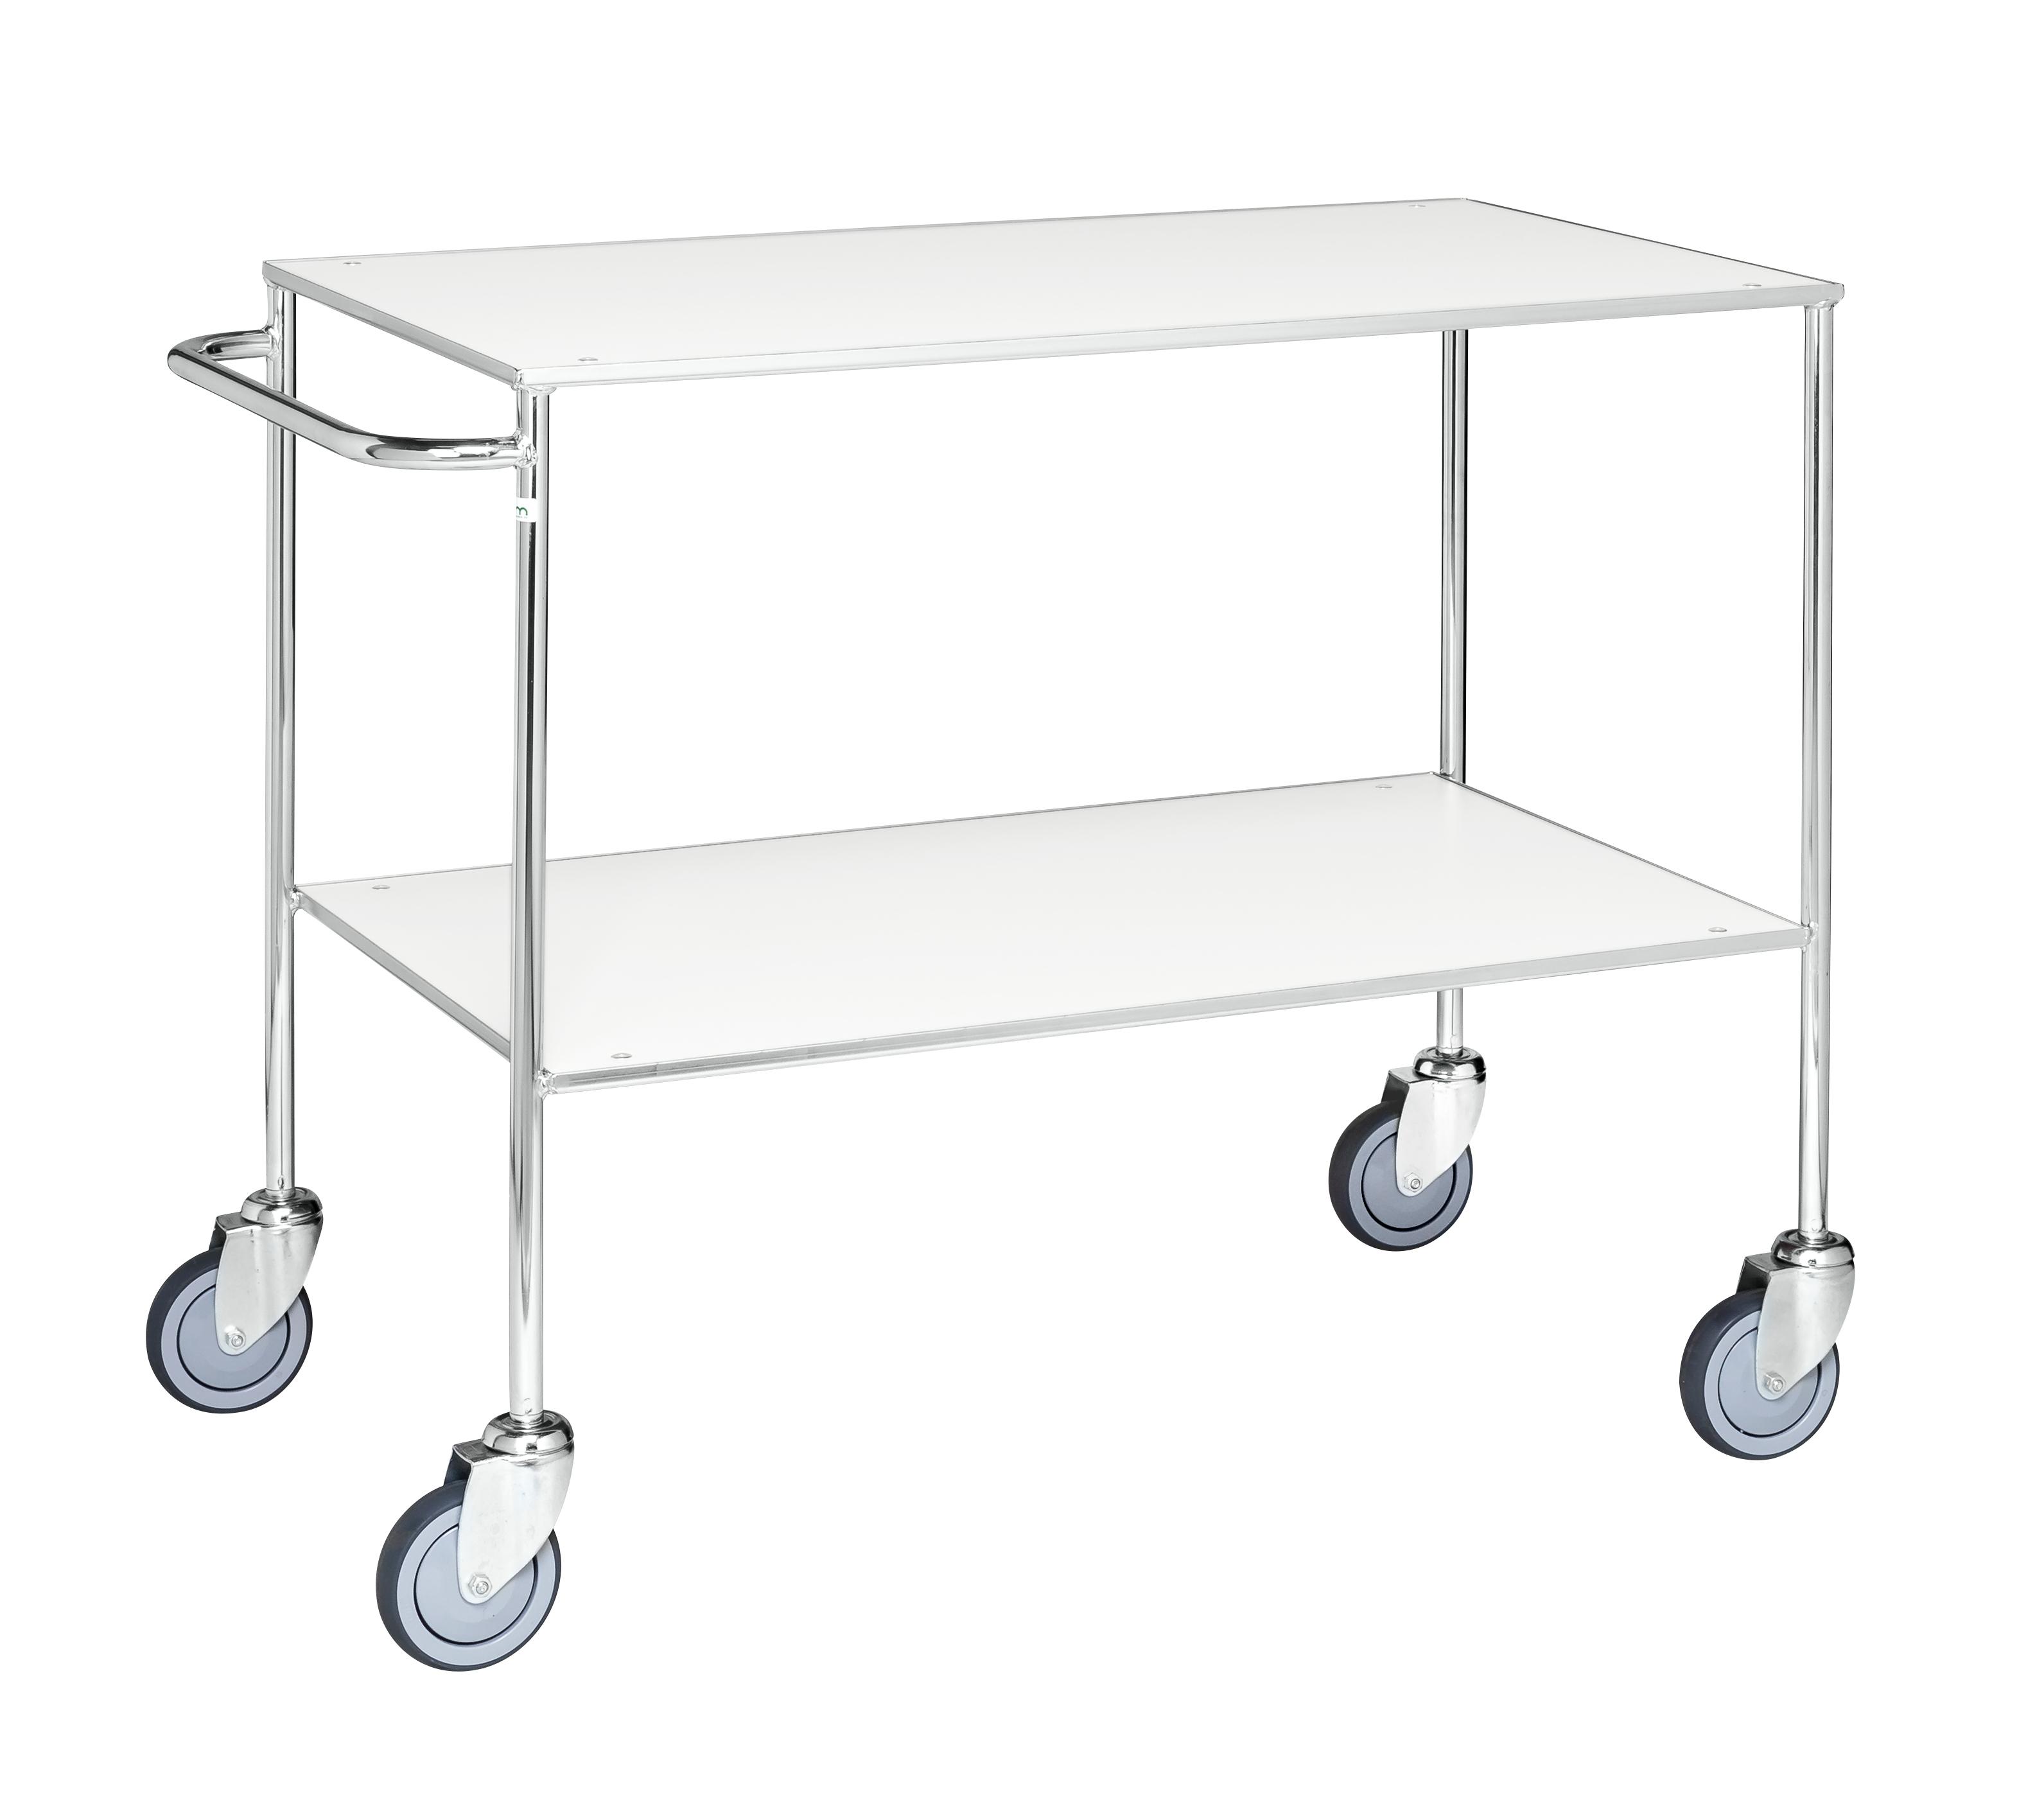 Table trolley, all-welded KM170-6B